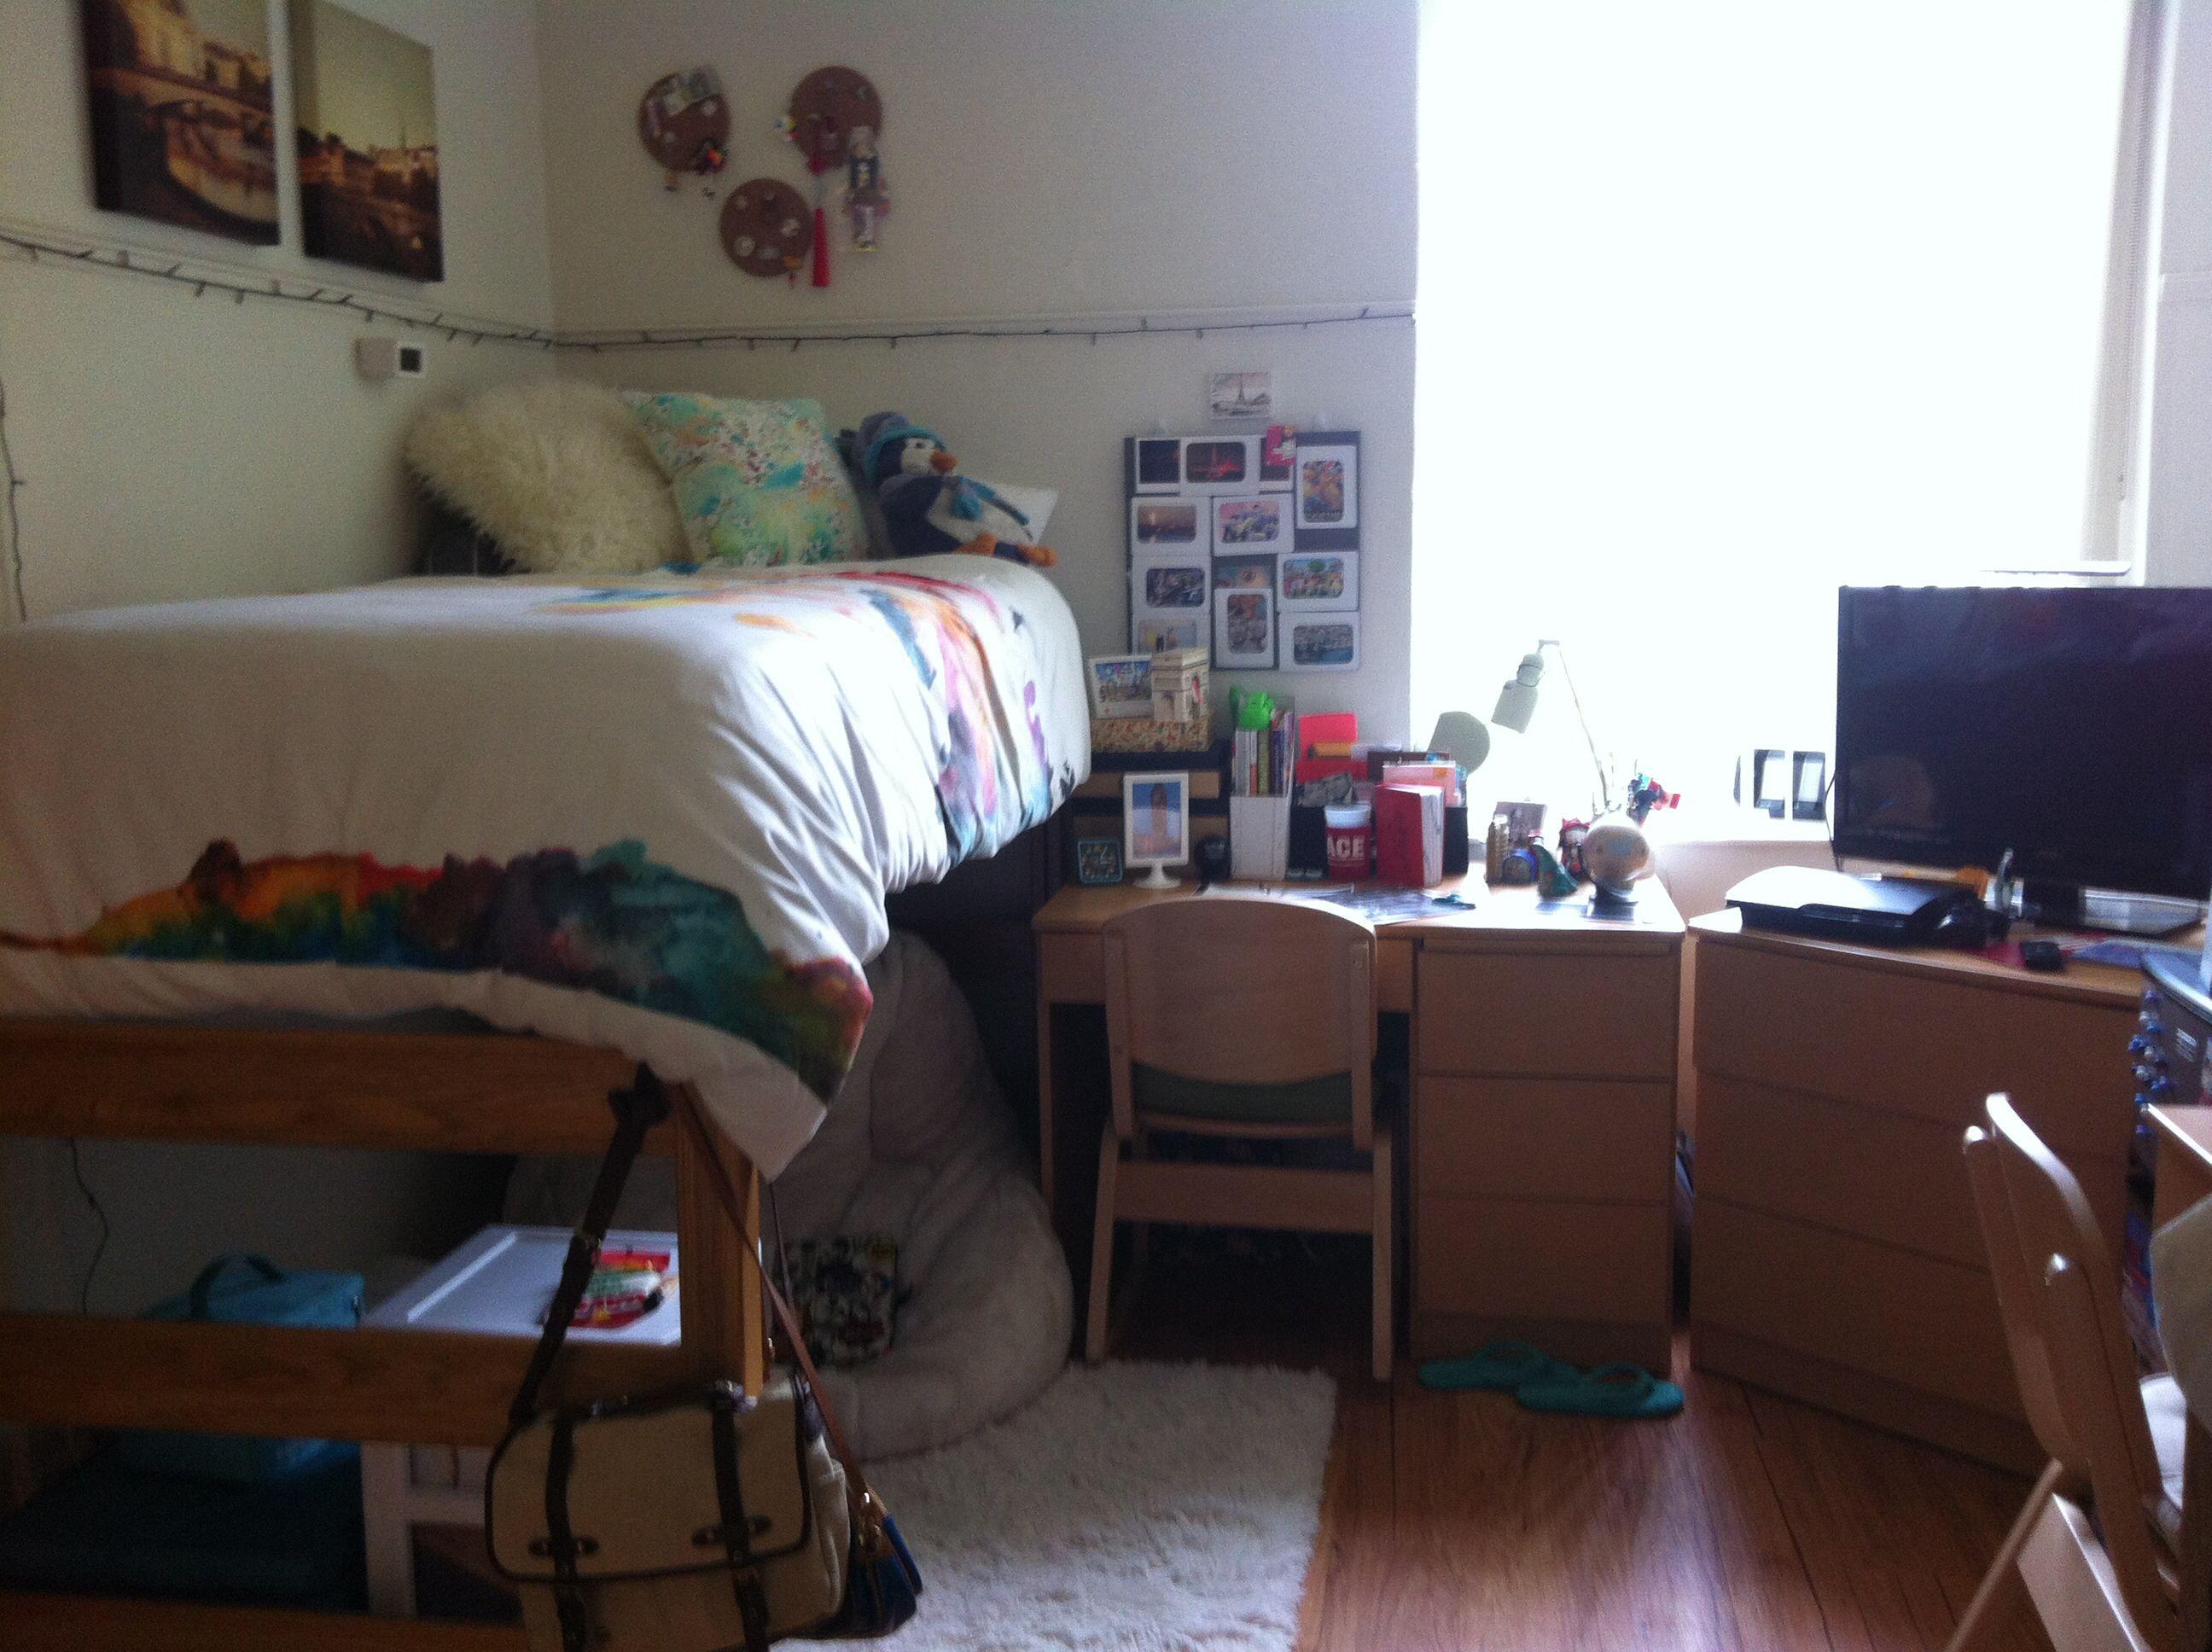 Dorm room idea at florida southern college theme world - Small dorm room ideas ...